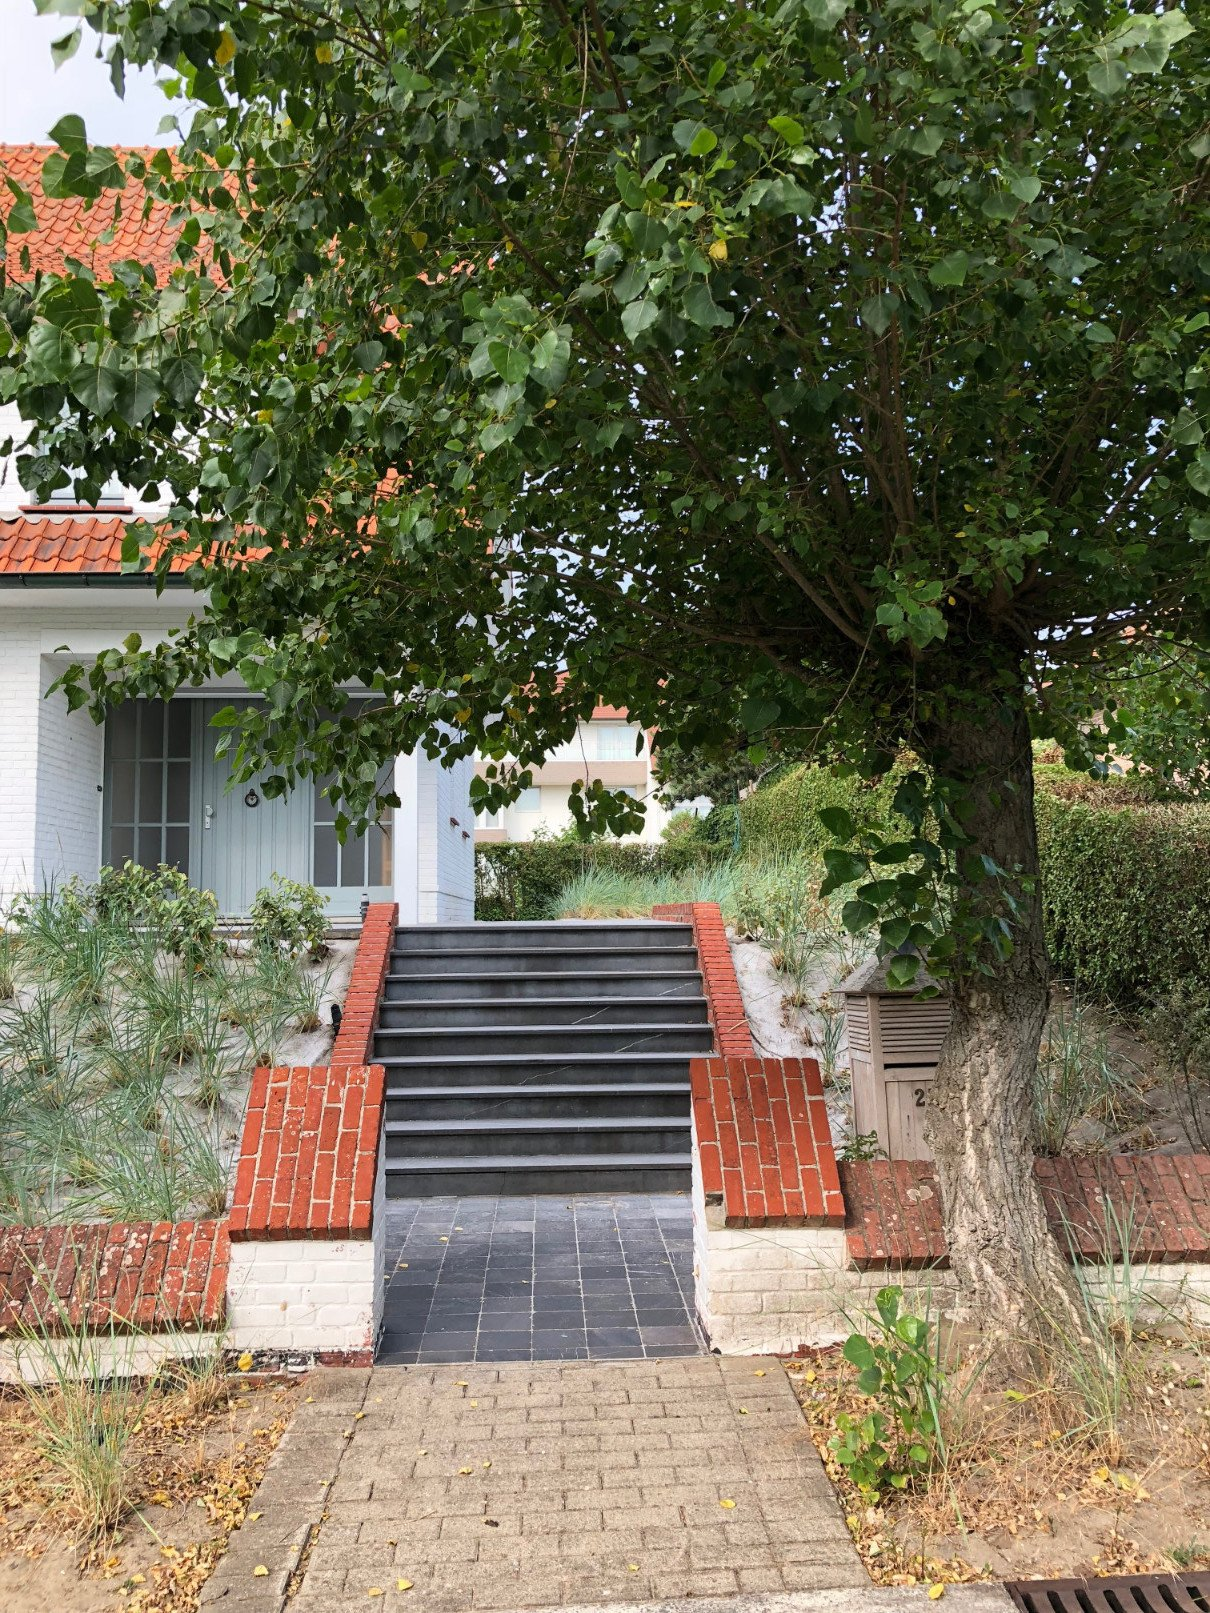 Rietveldprojects-Villa Were Di - Te Koop : Te Huur (per week)21.jpg